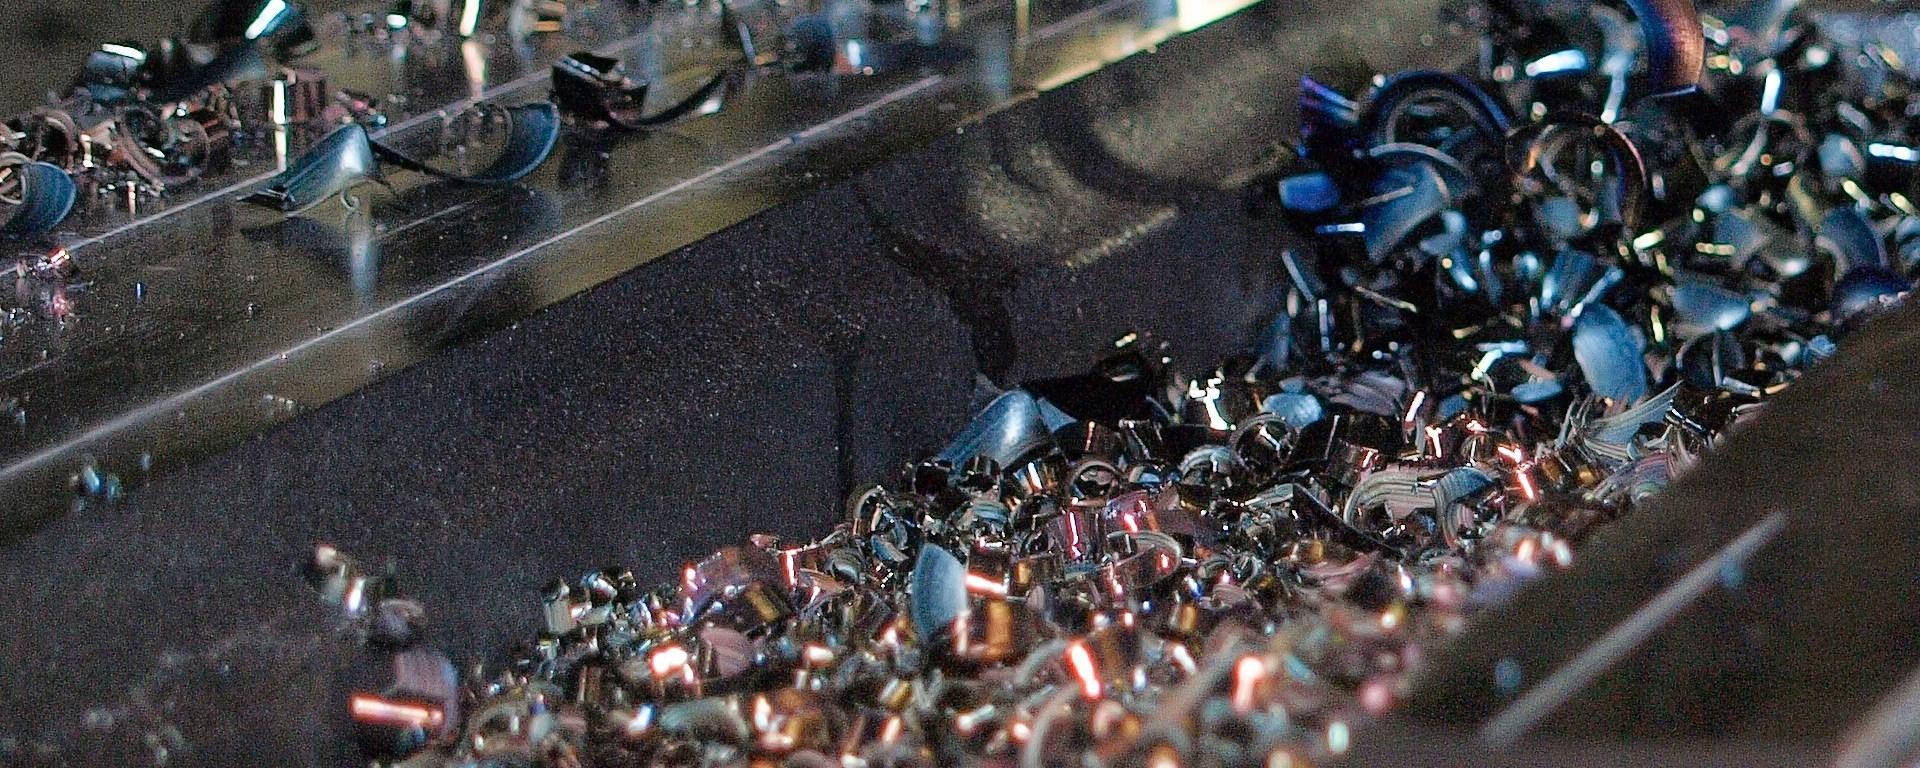 study cnc machining in connecticut